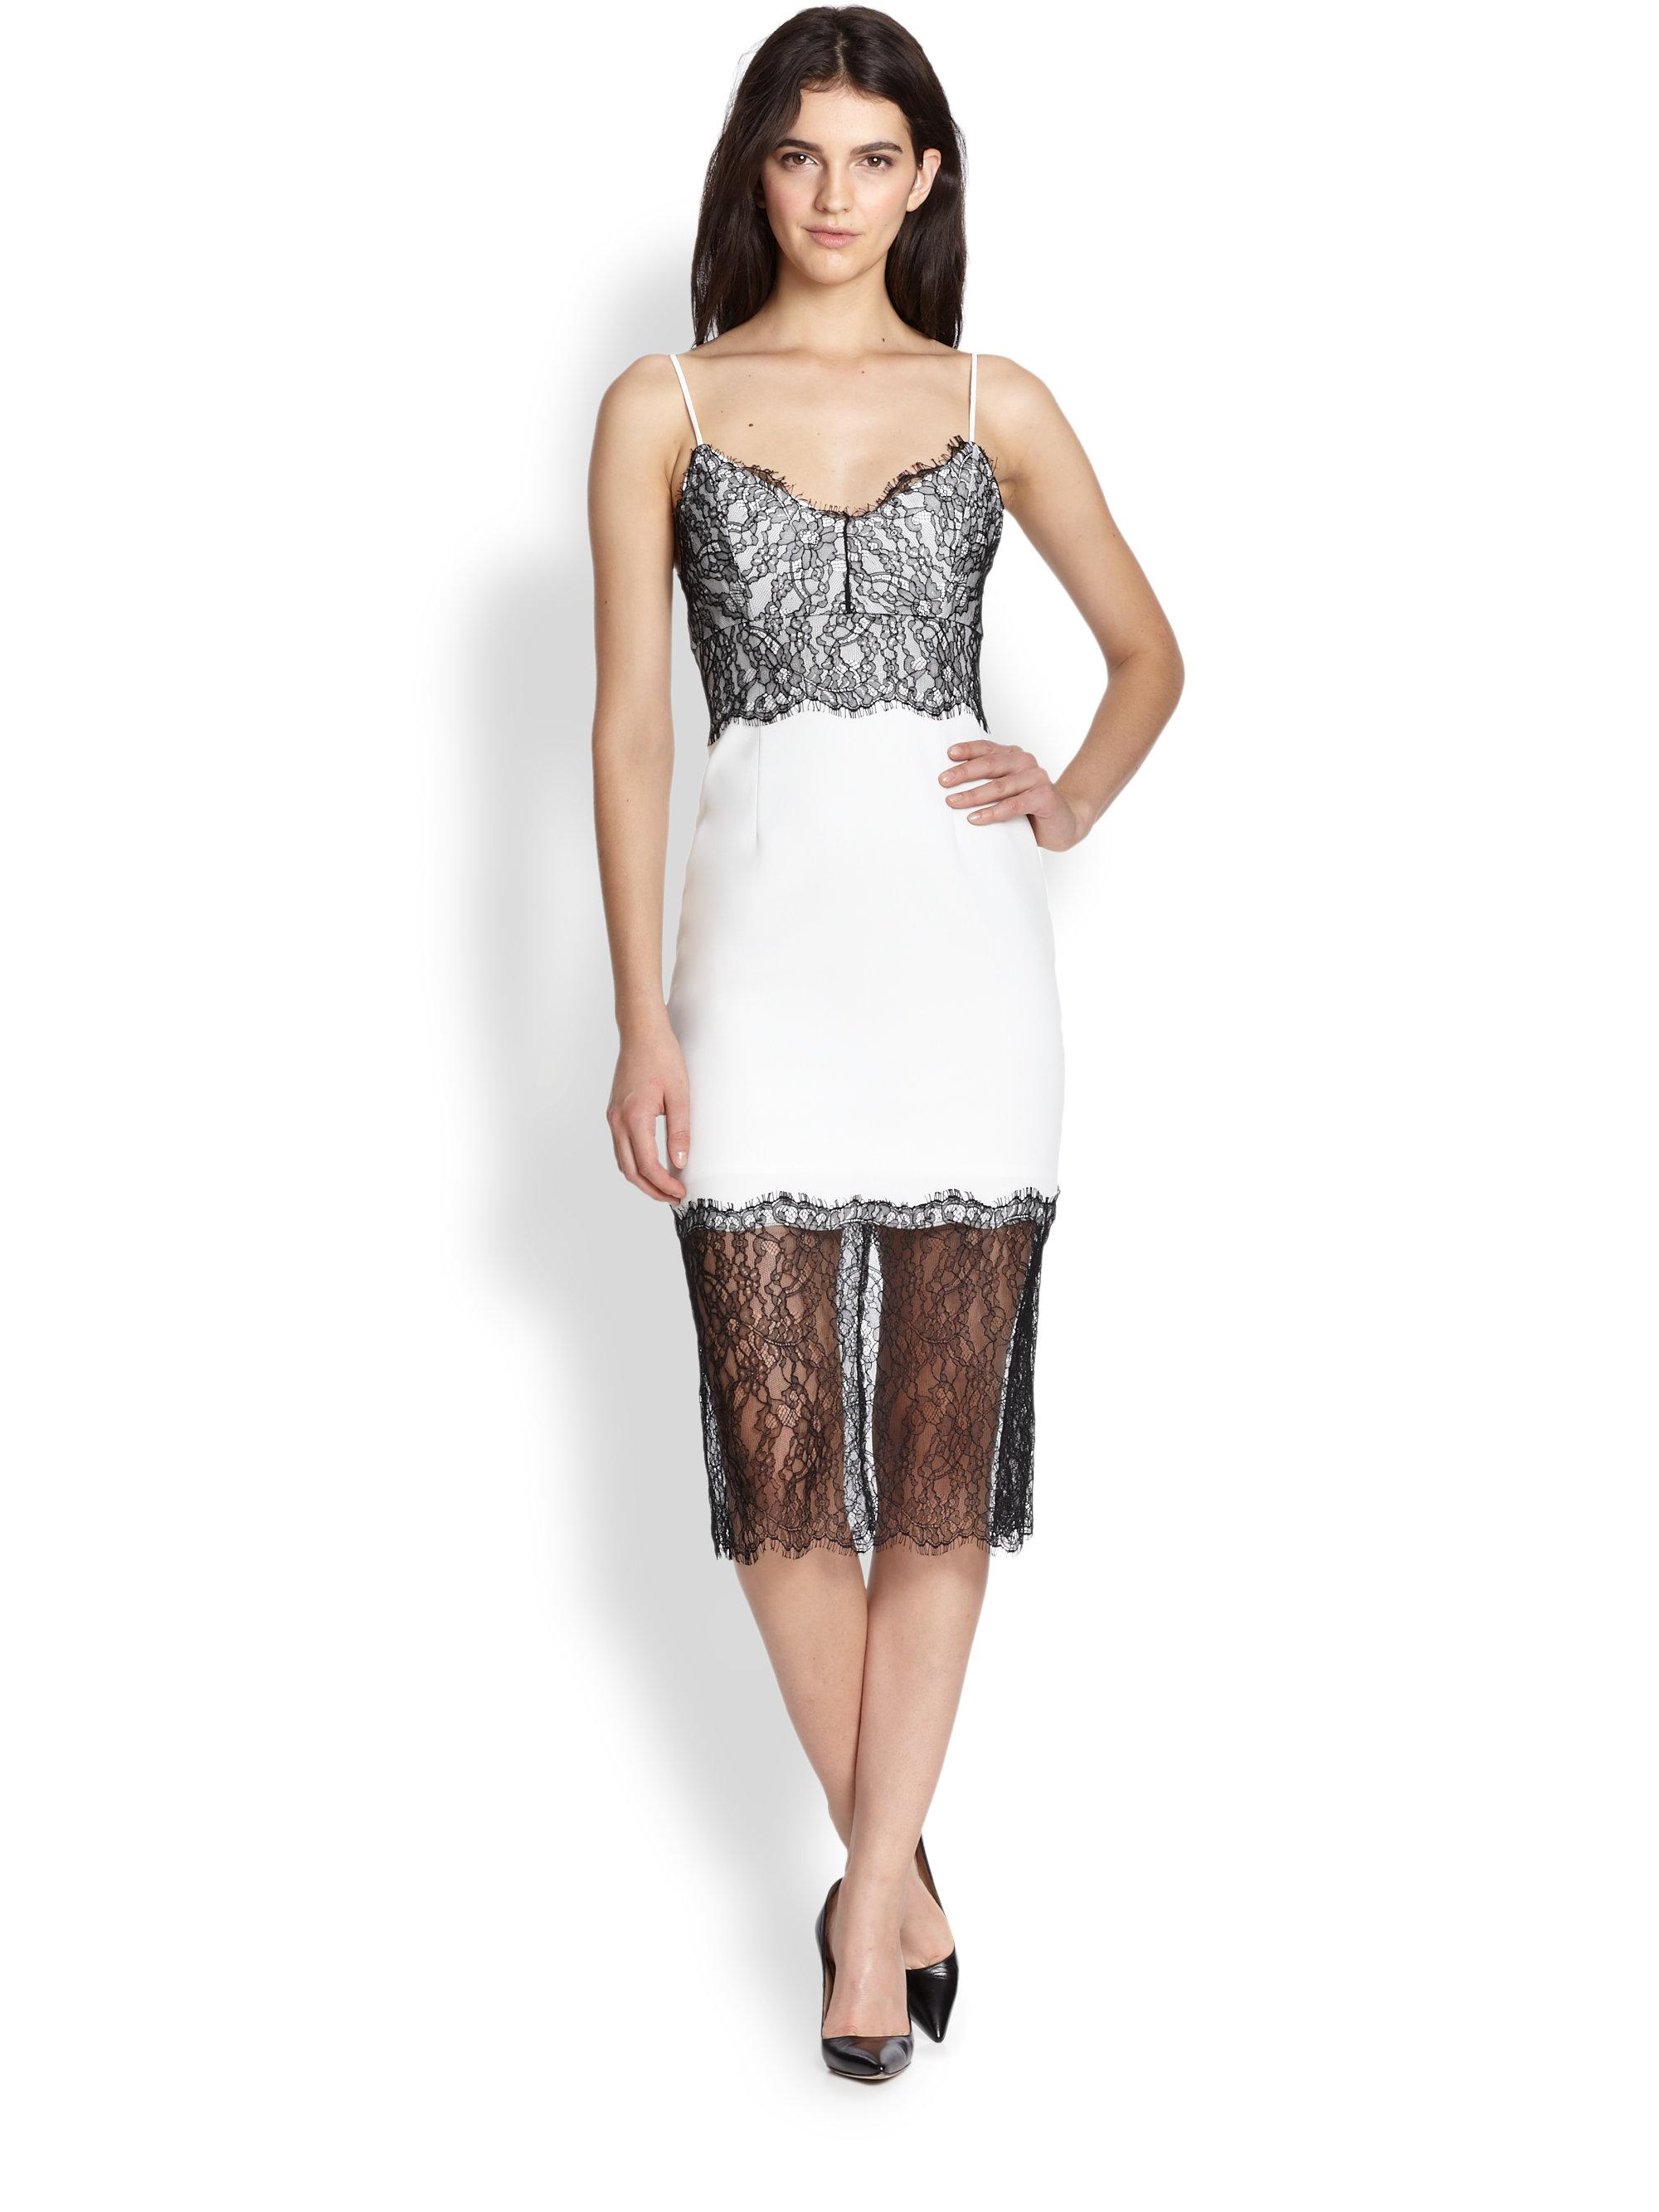 Galerry sheath dress with flats